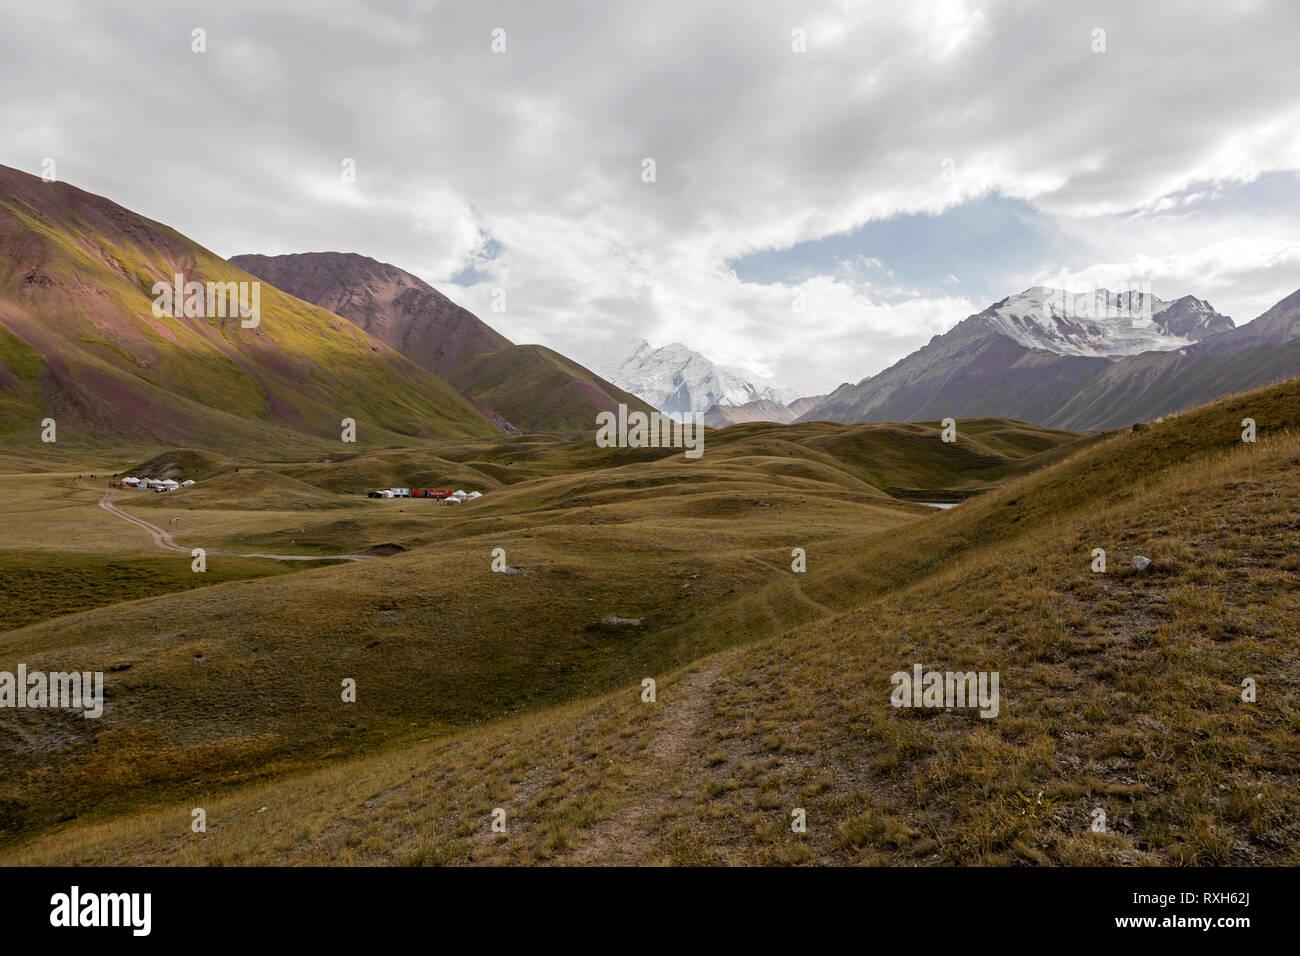 Tulpar, Kyrgyzstan August 21 2018: Yurt Base Camp at Tulpar Lake at the foot of Peak Lenin in Kyrgyzstan Stock Photo